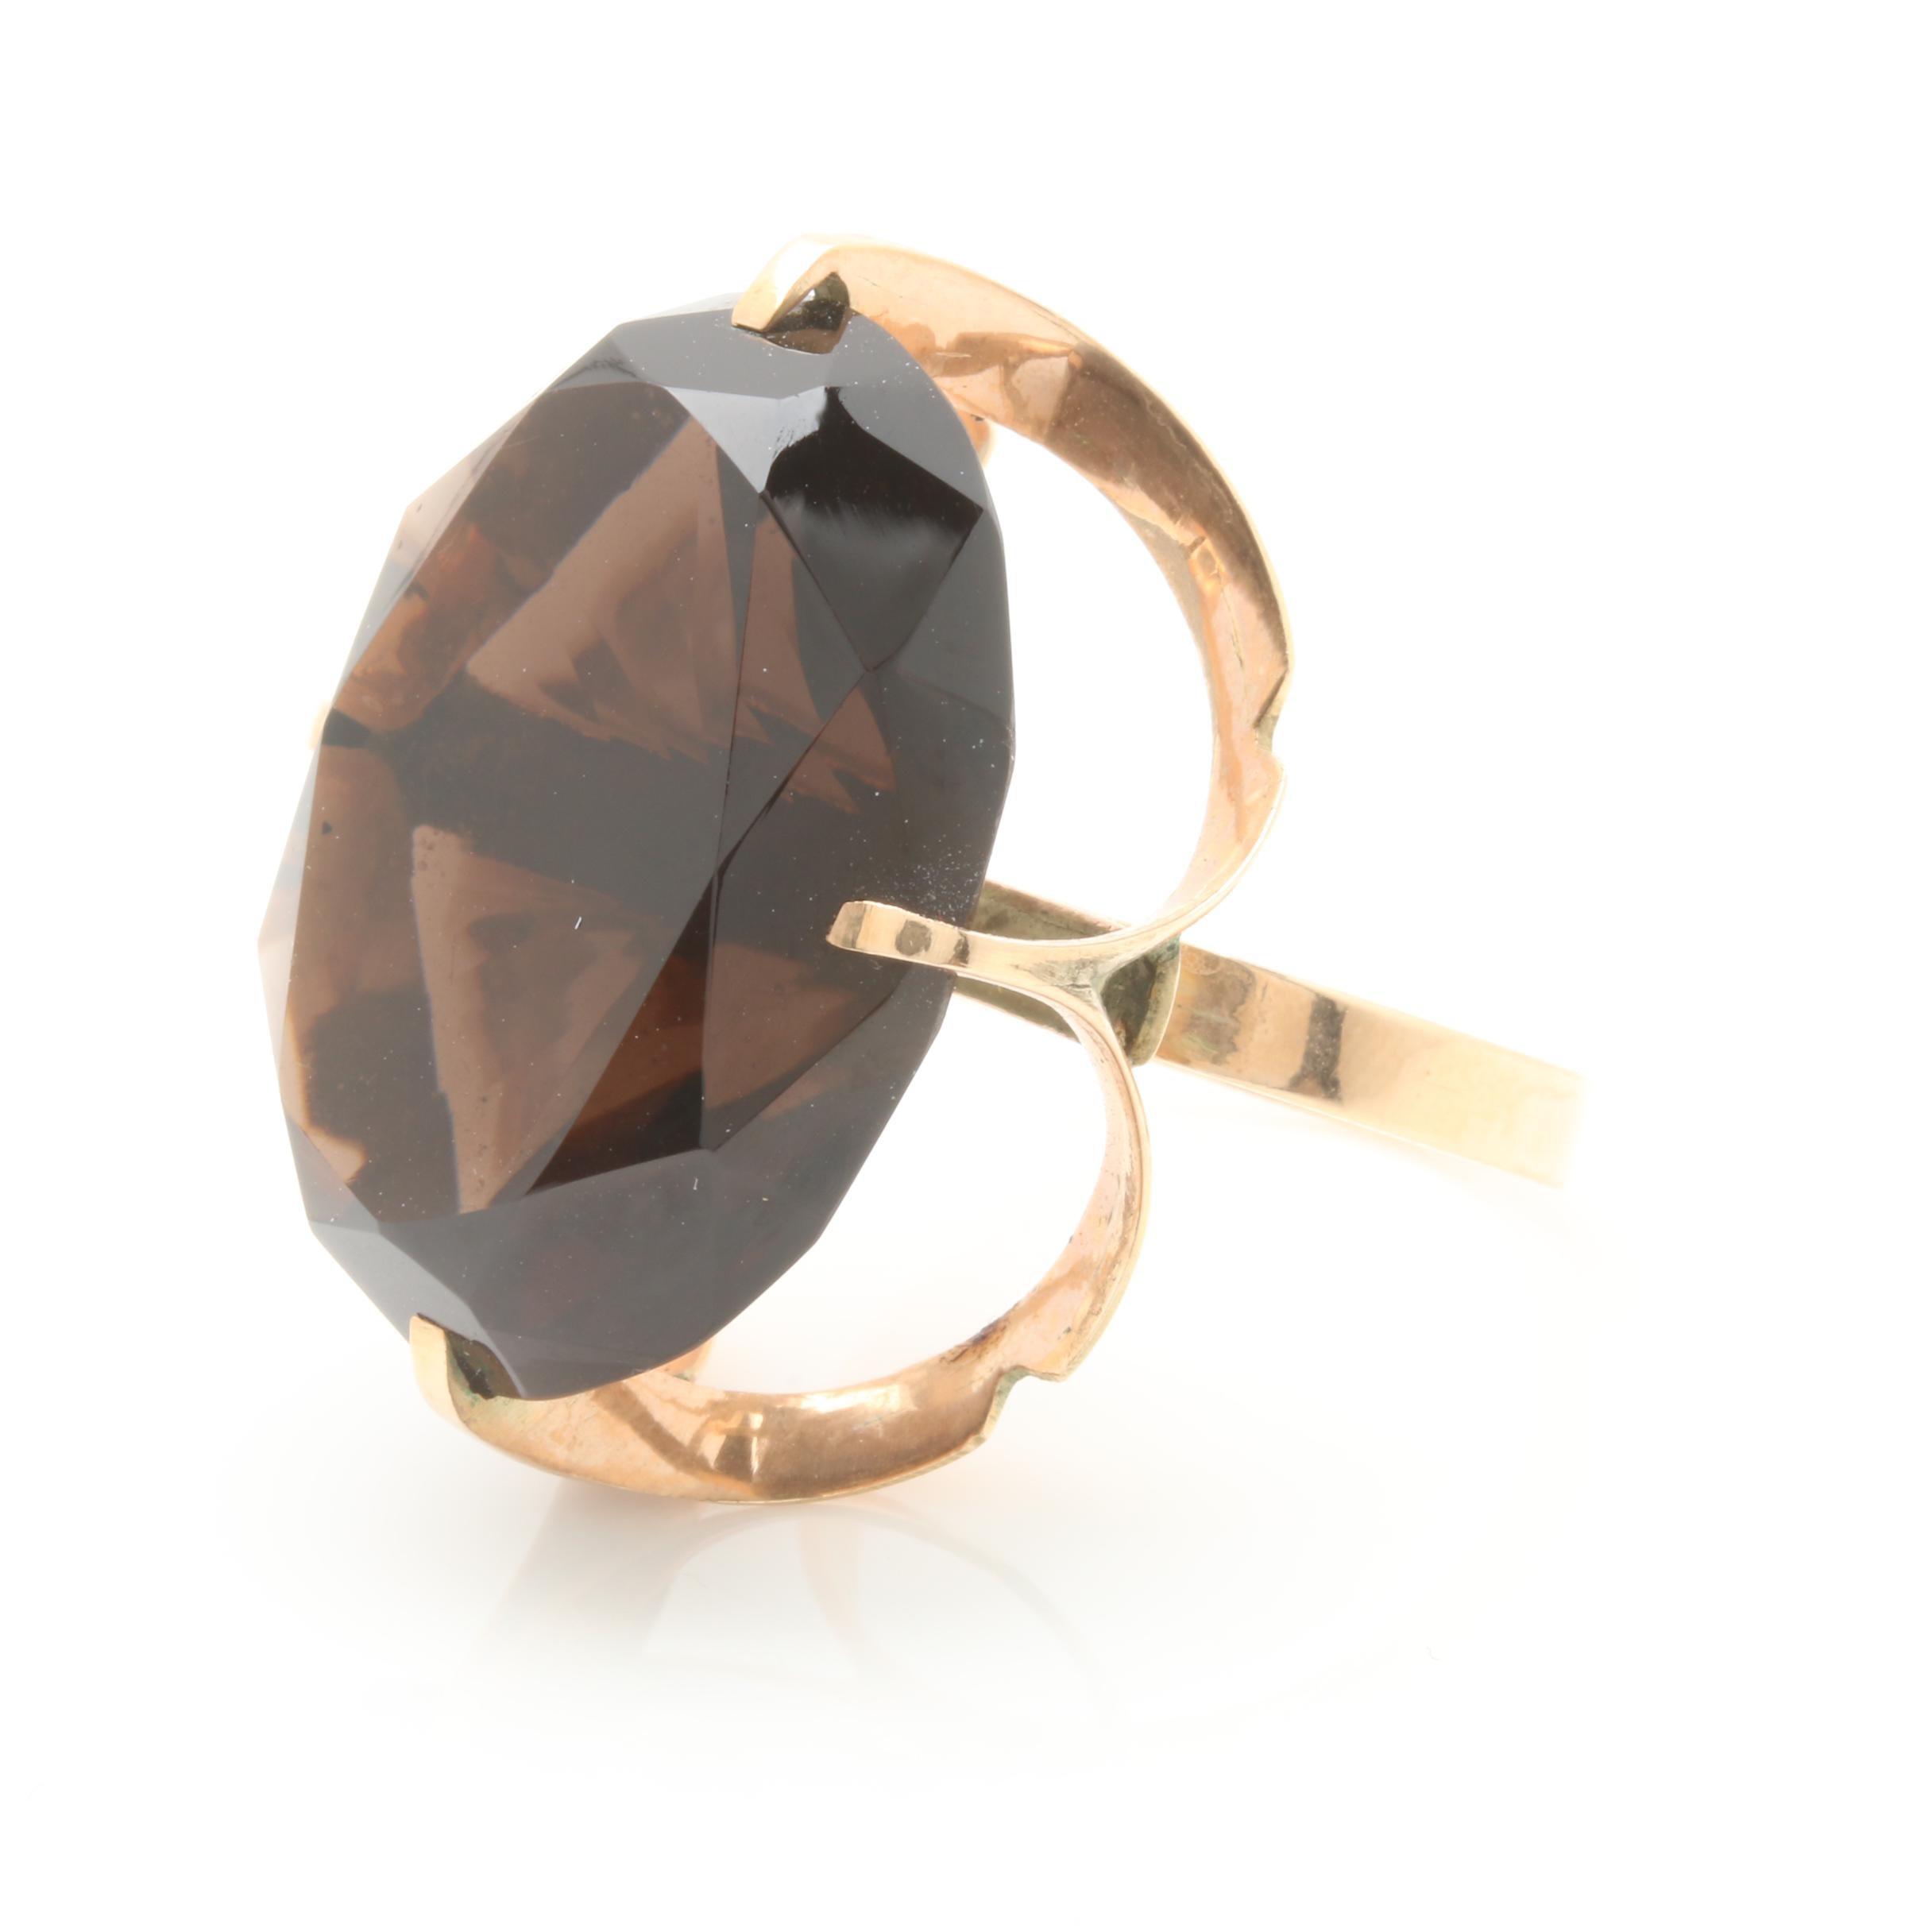 1960s - 1970s 14K Yellow Gold 33.16 CT Smoky Quartz Ring